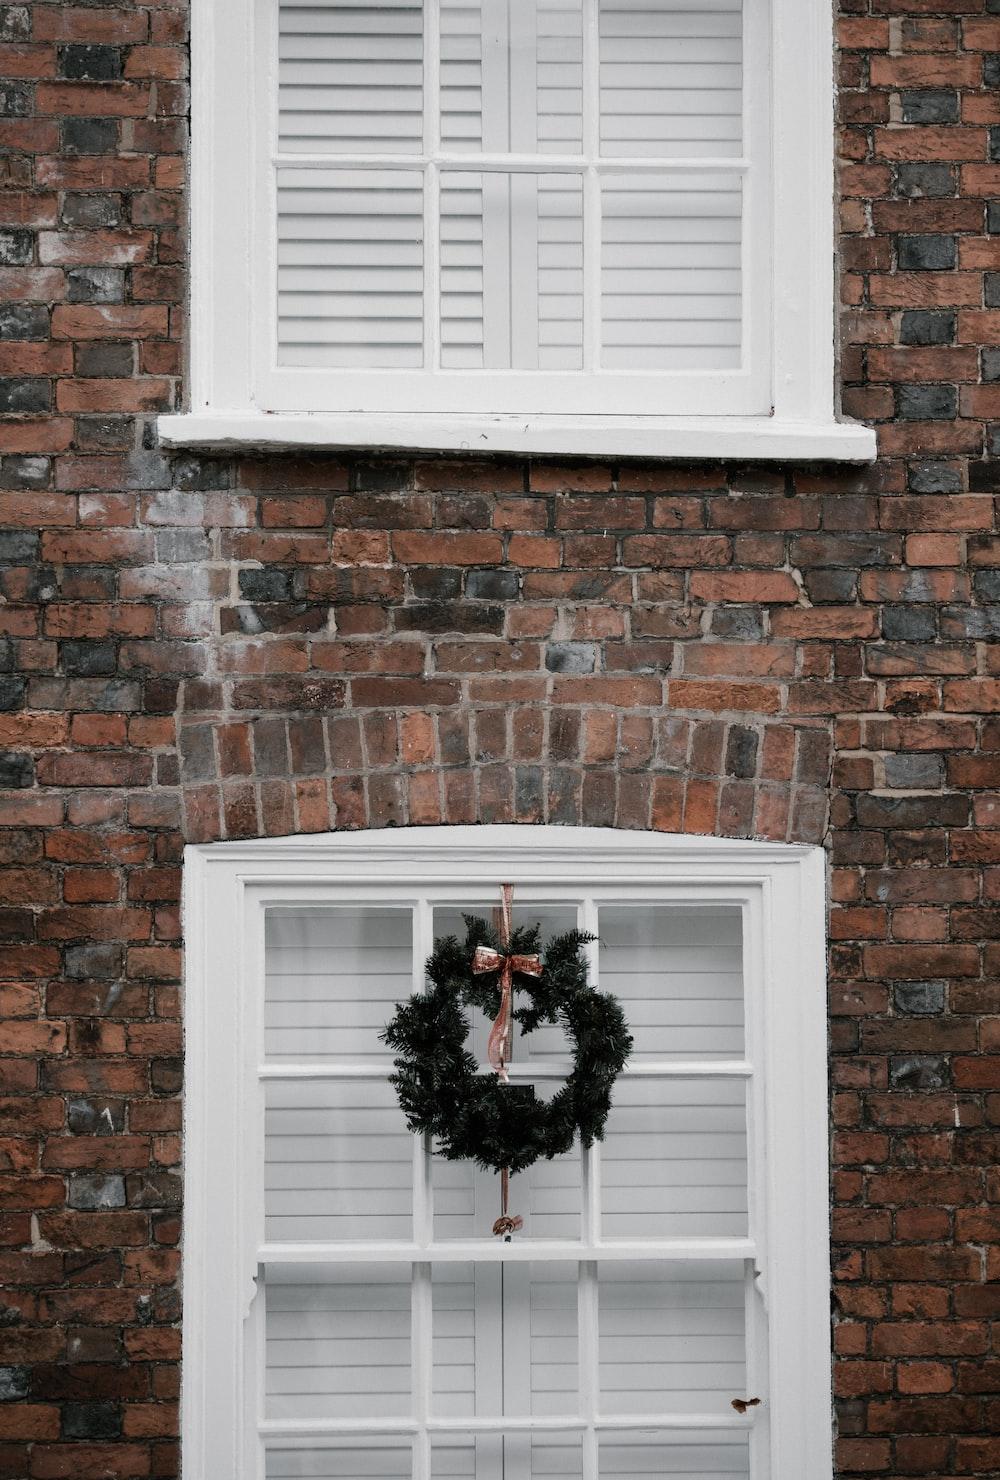 green wreath hanging on white window